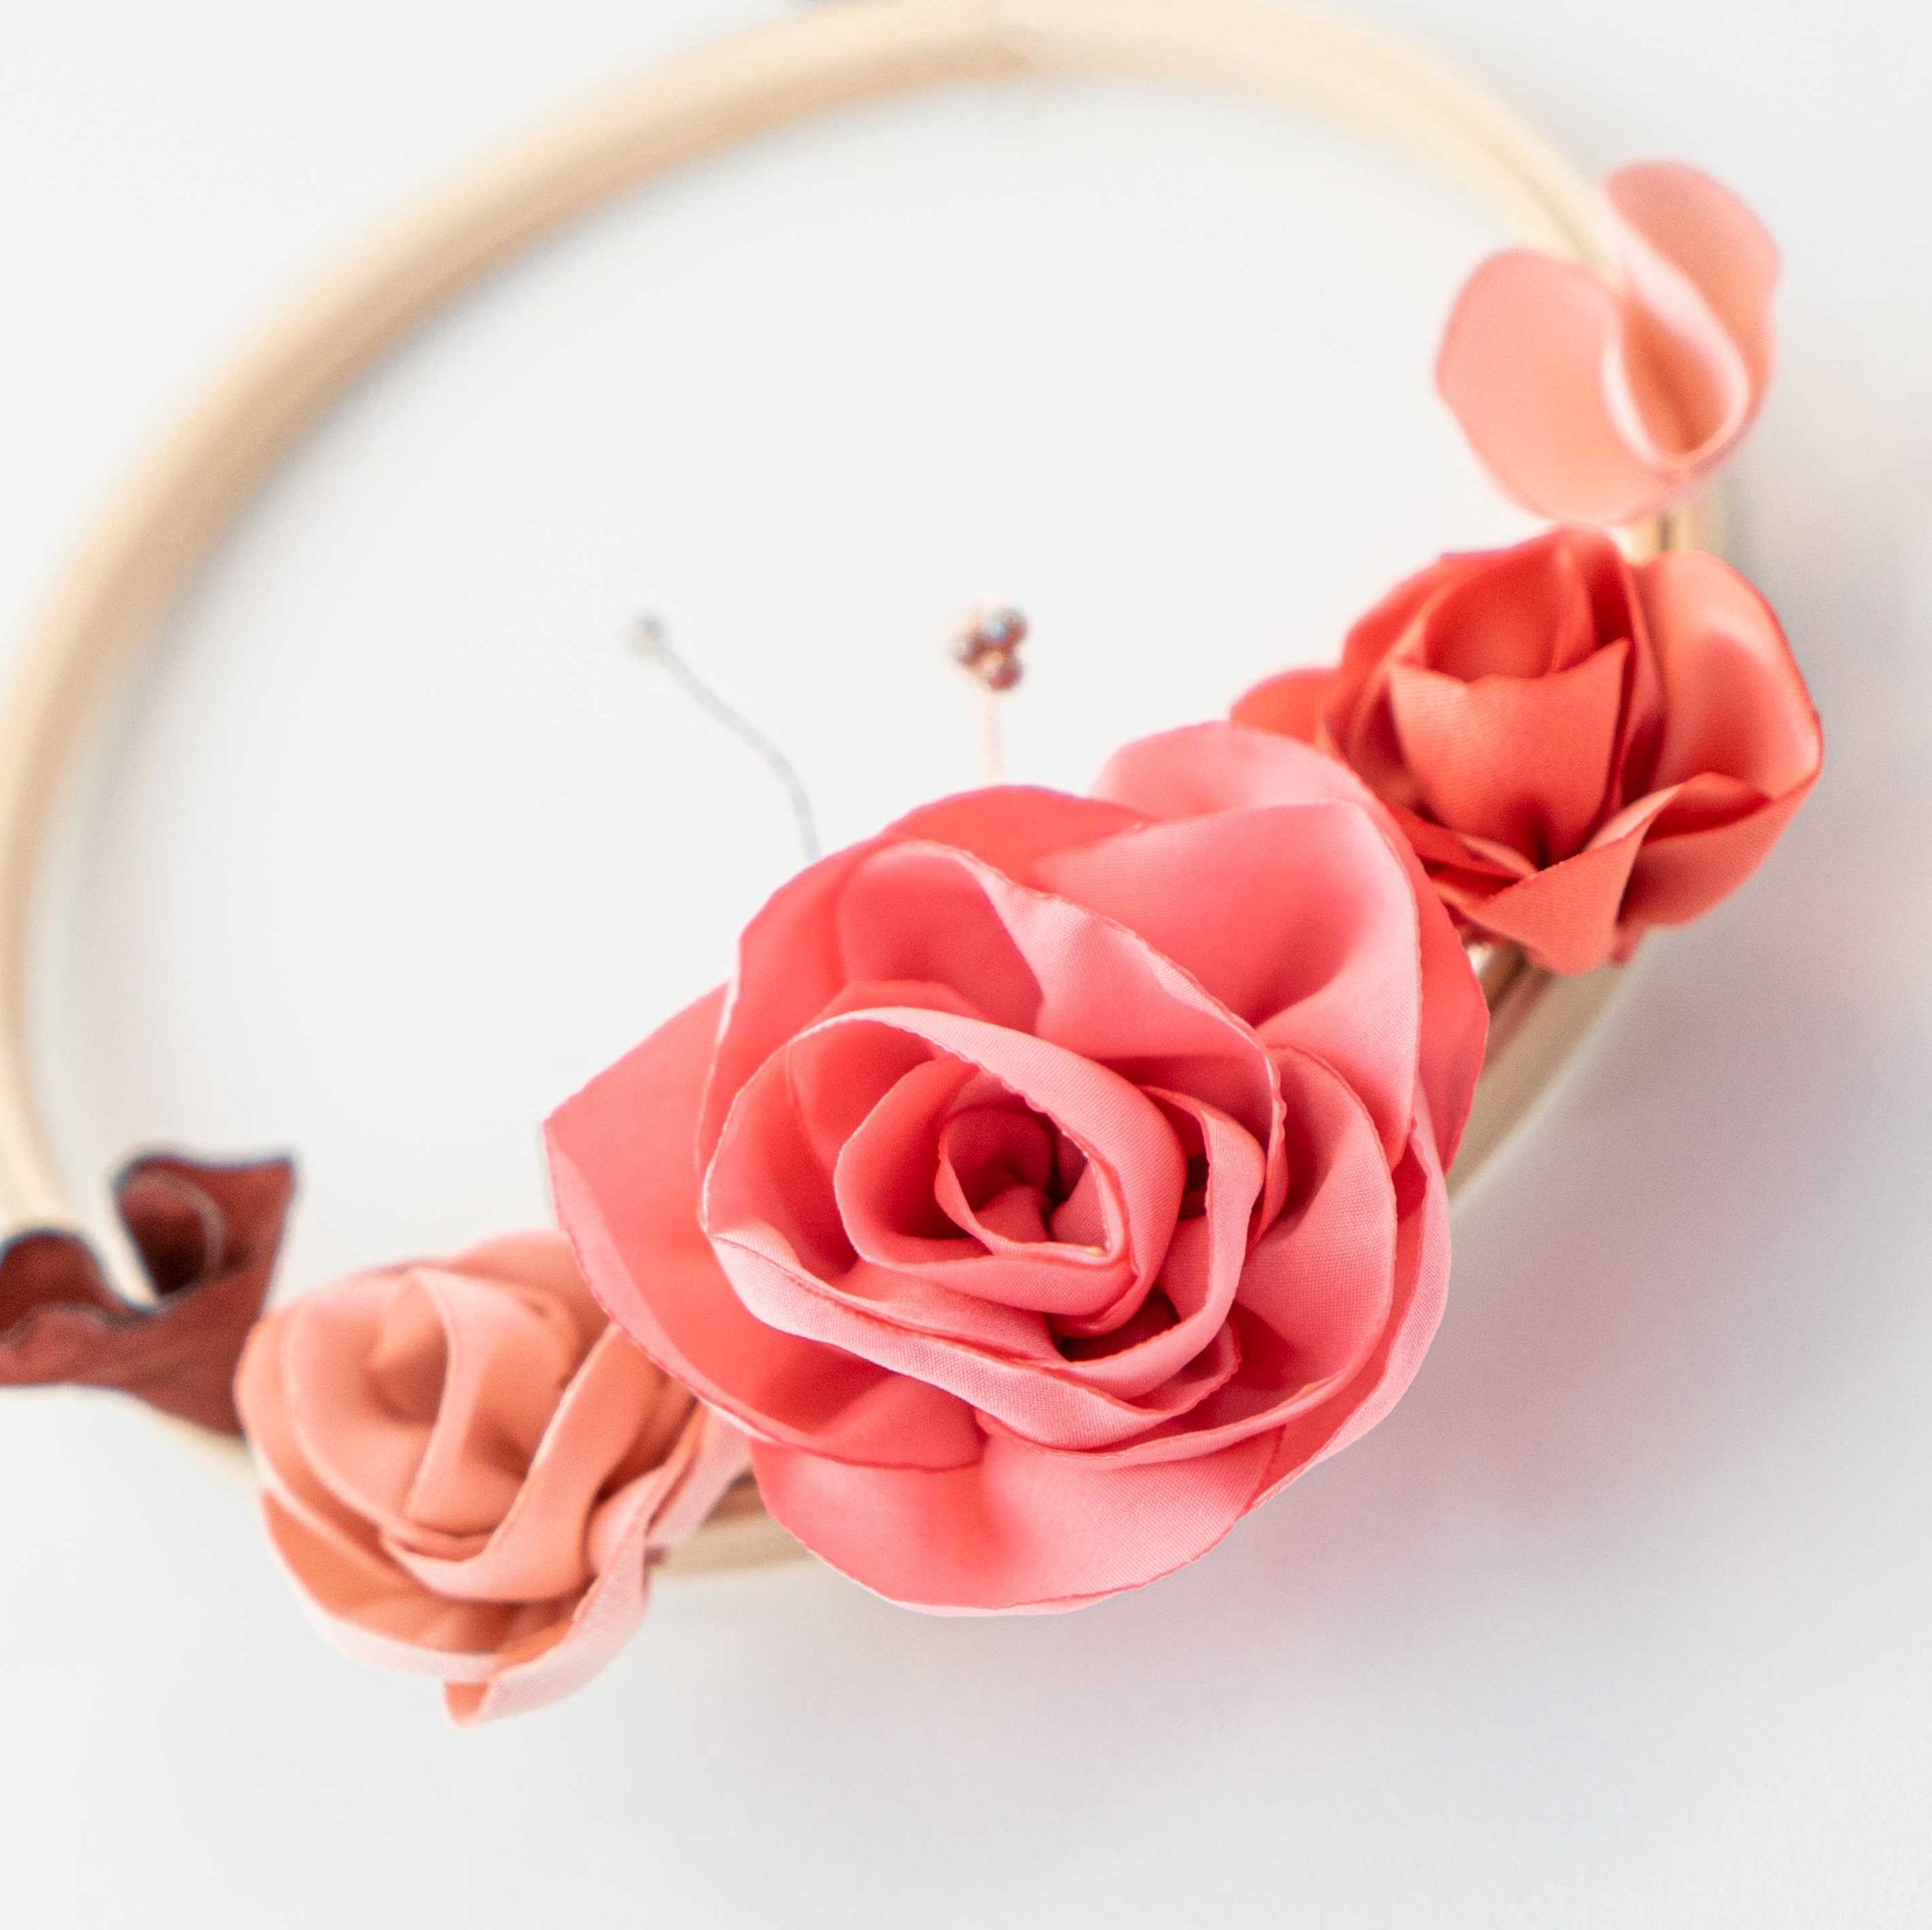 Cercle fleuri 1 Alice Marty - Couture florale Accessoires Mariage